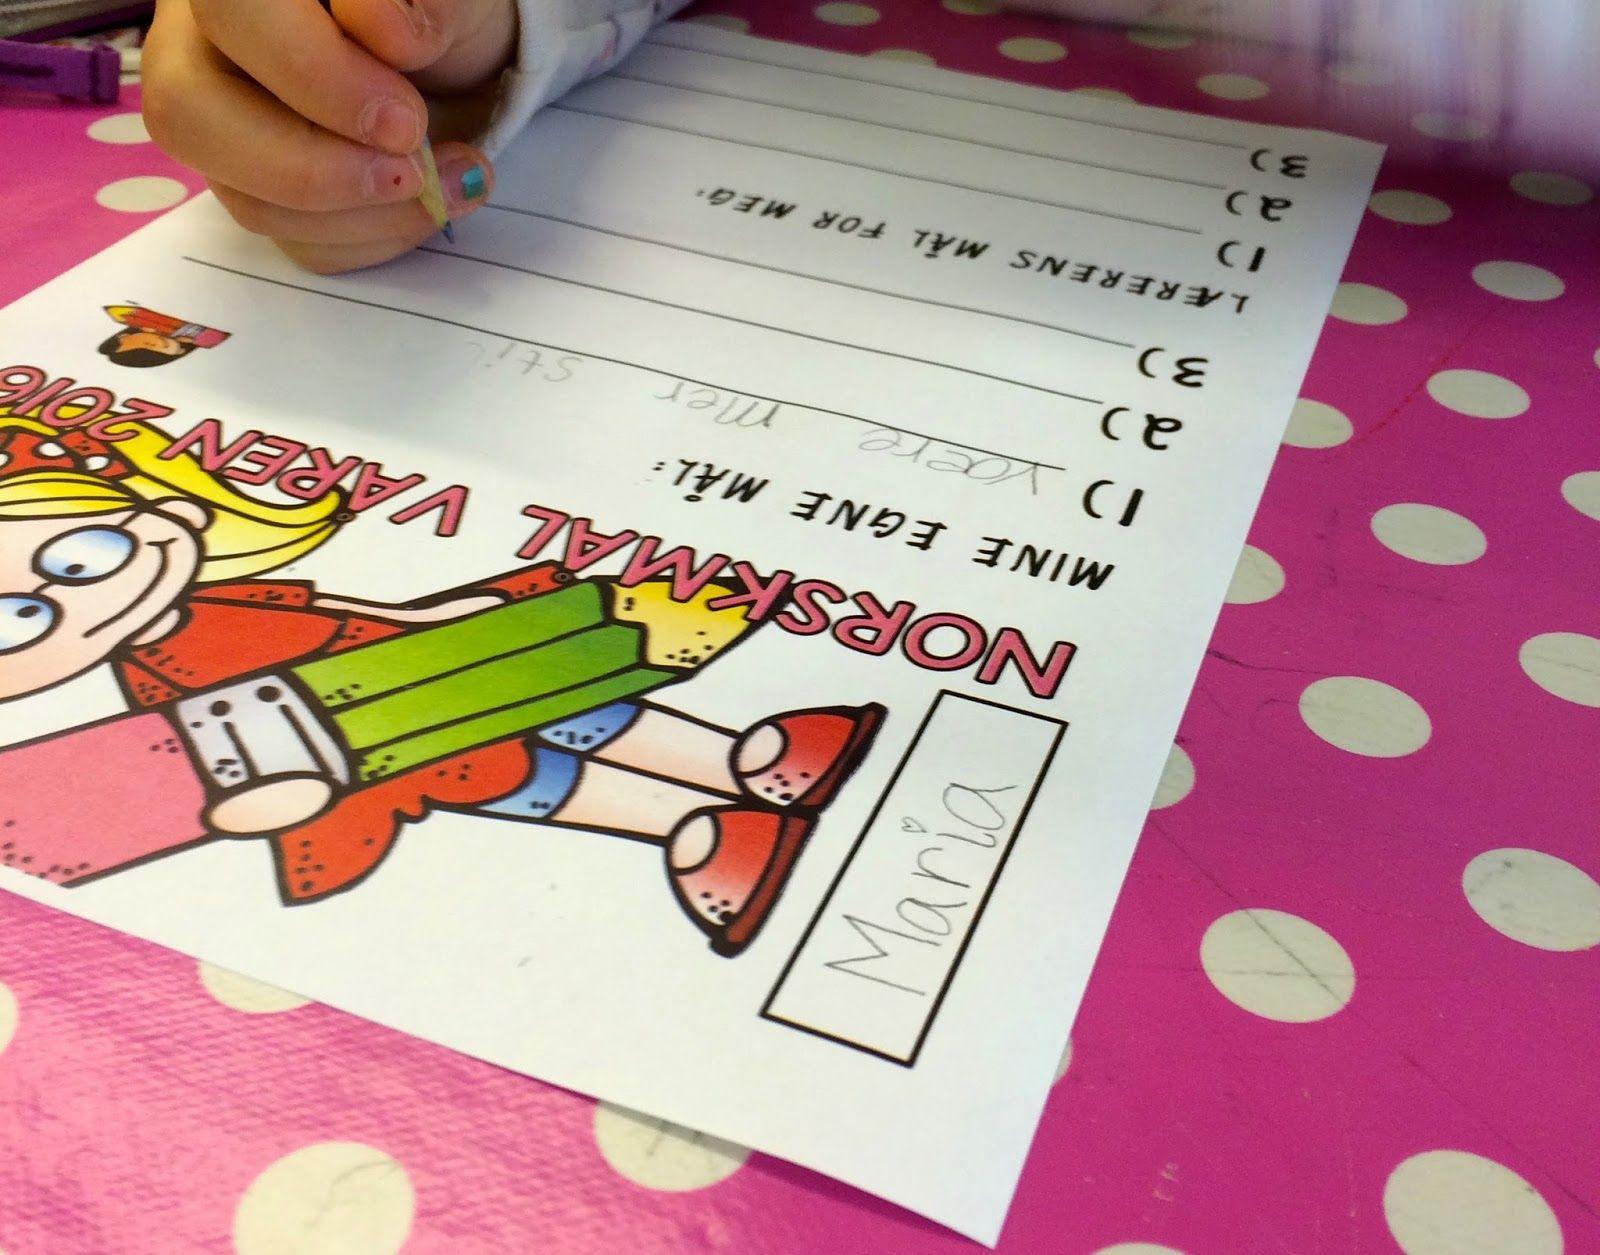 Teaching FUNtastic: La elevene bestemme målene!